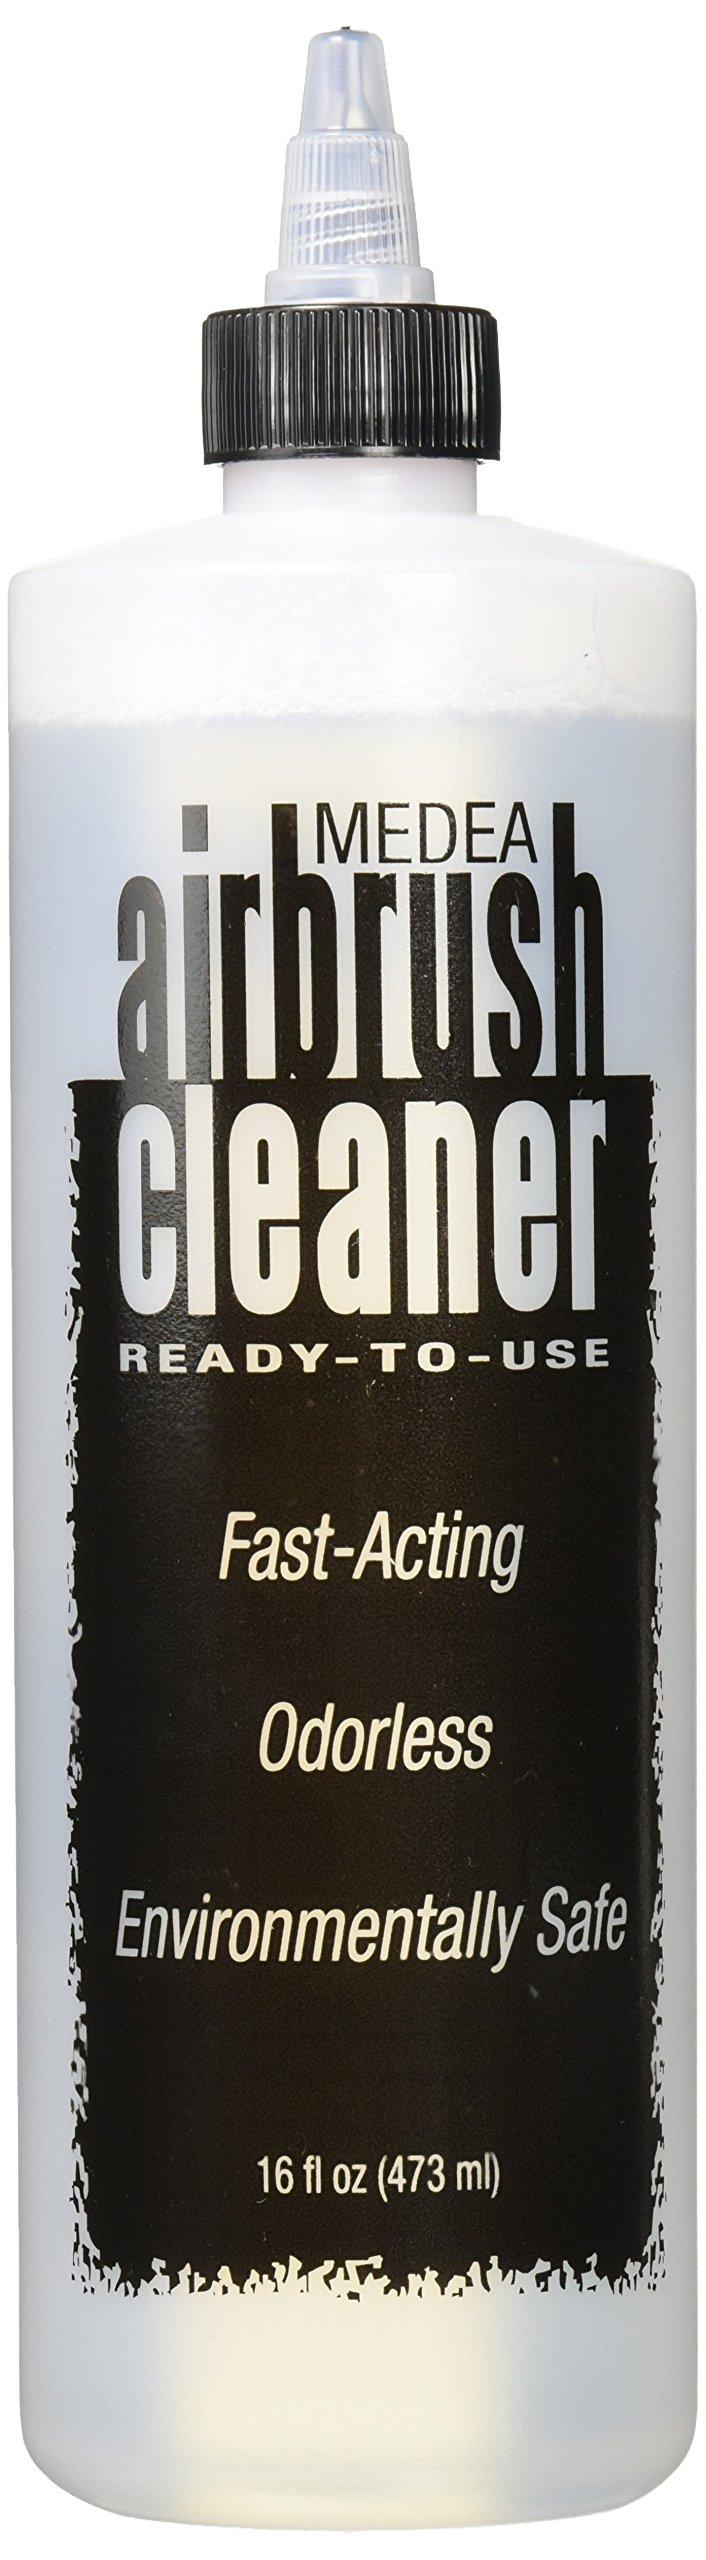 Iwata-Medea Airbrush Cleaner (16 Oz.) by Iwata-Medea